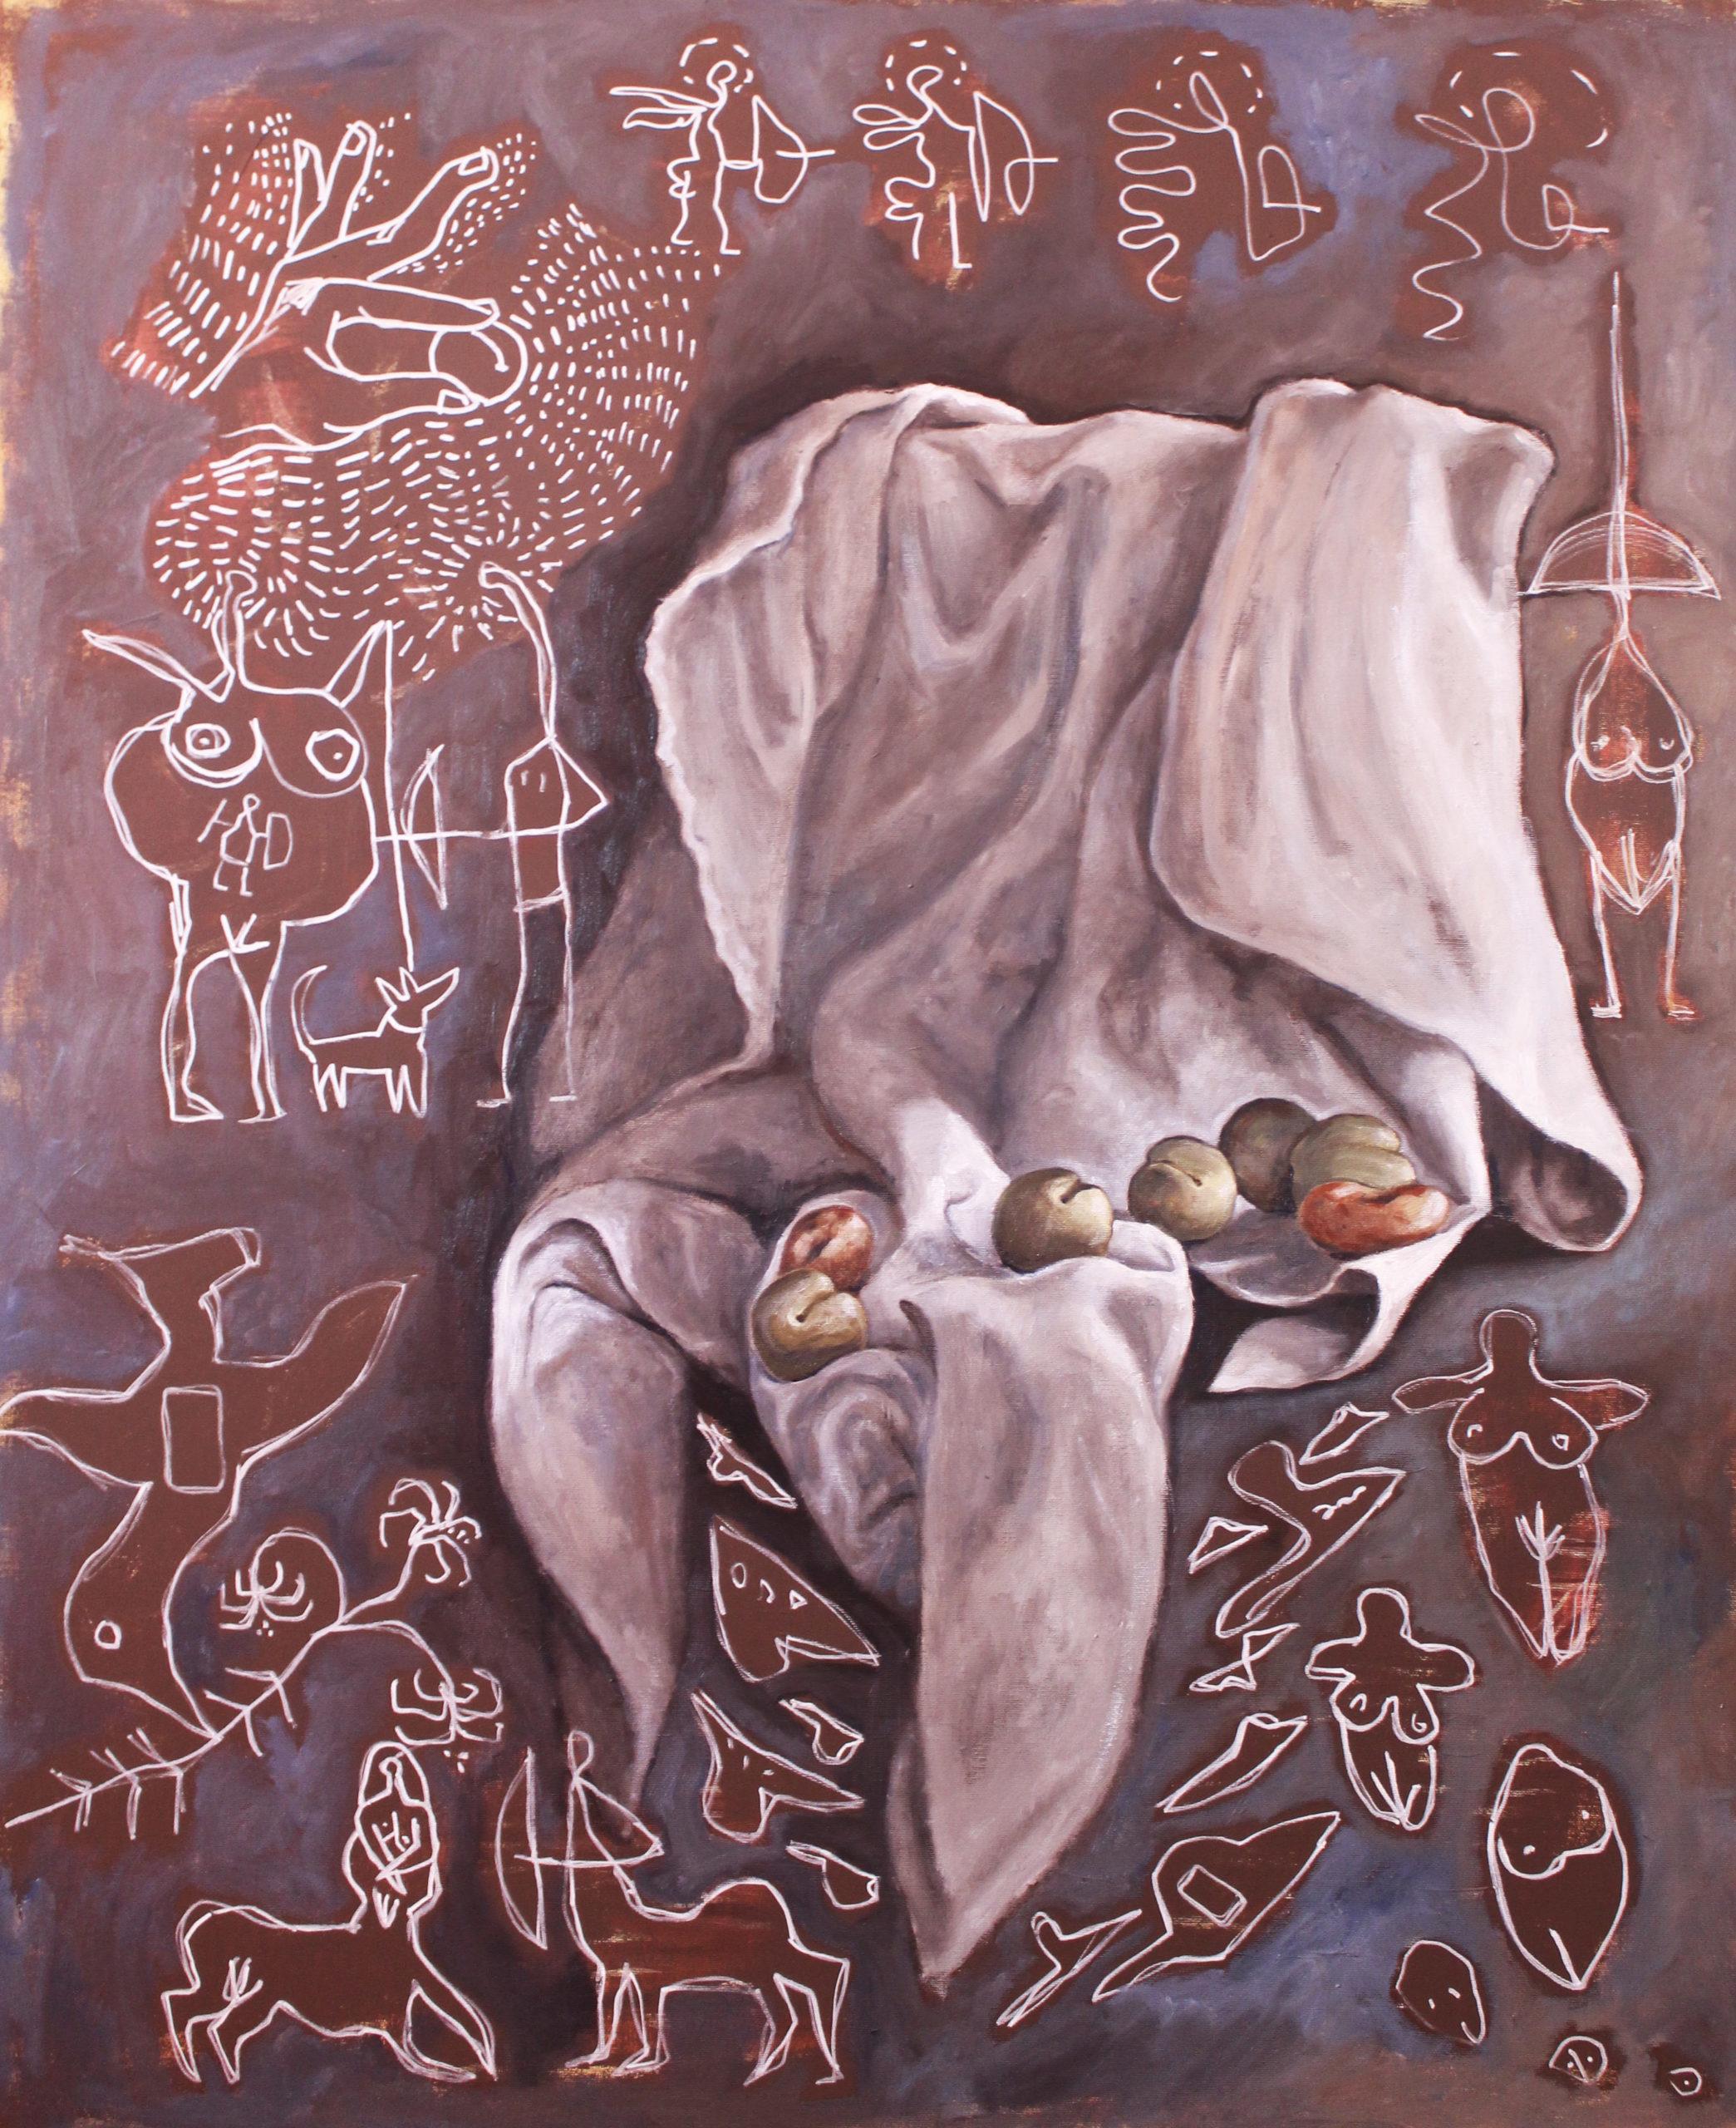 Bacco Artolini Ravenna painting artist 2019